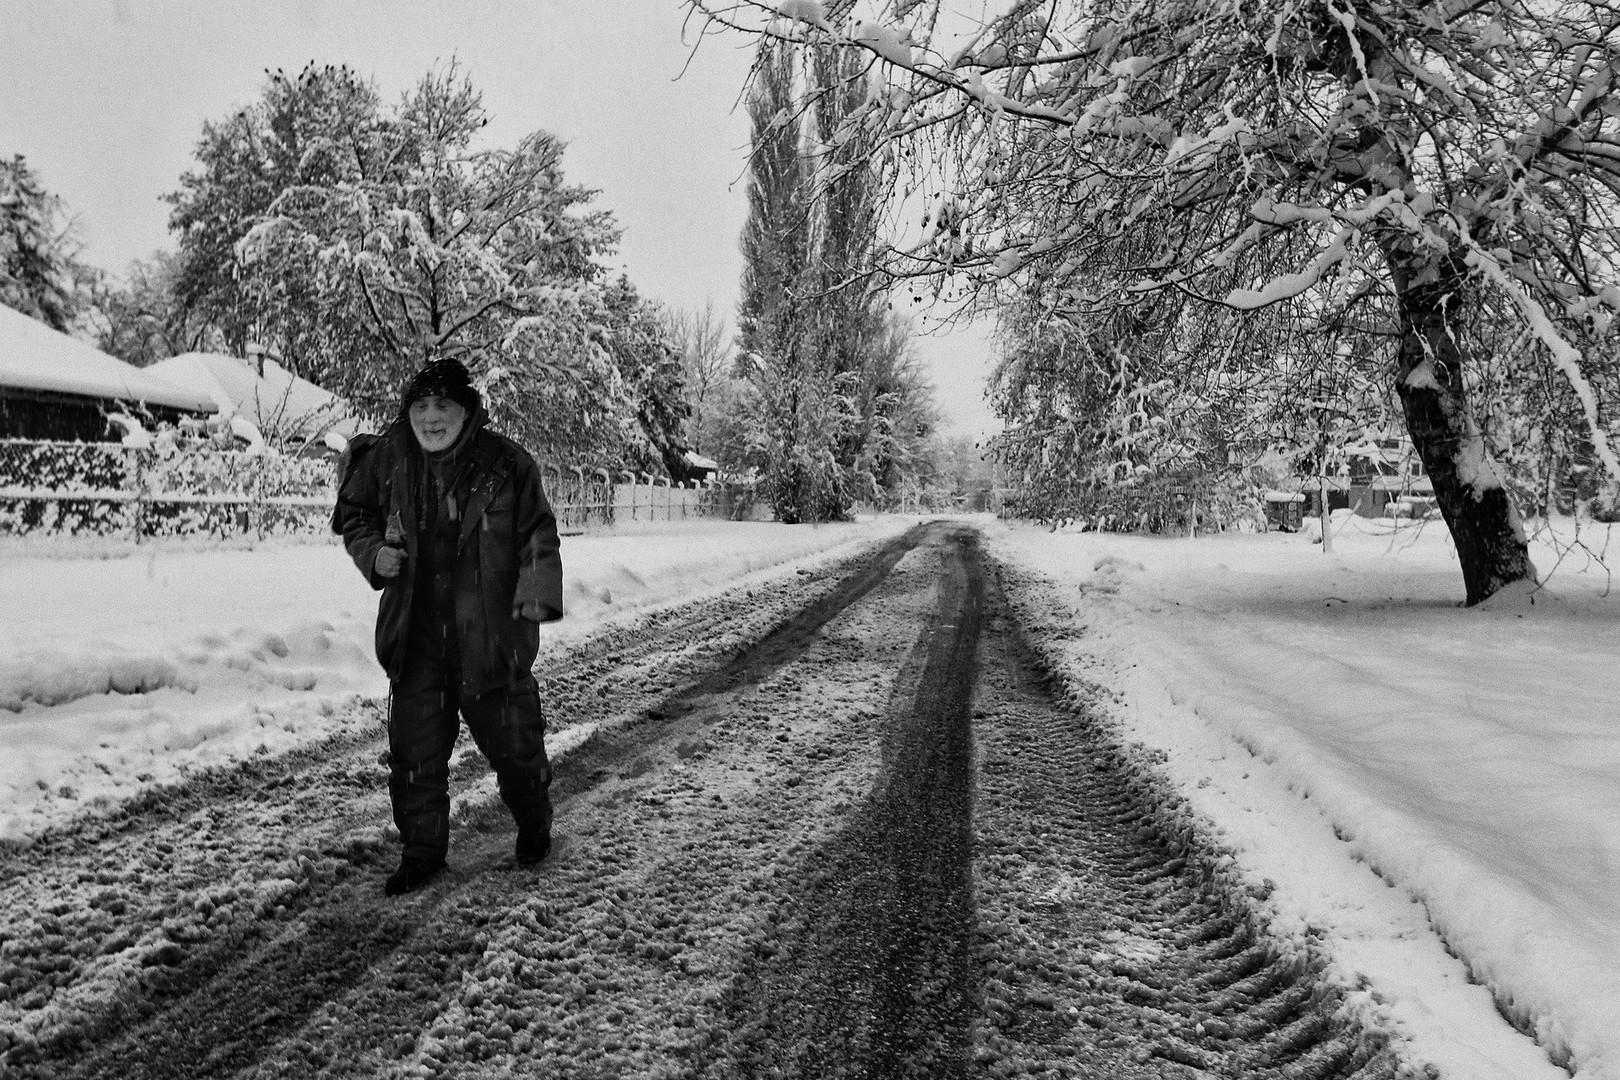 Stazama snežnim